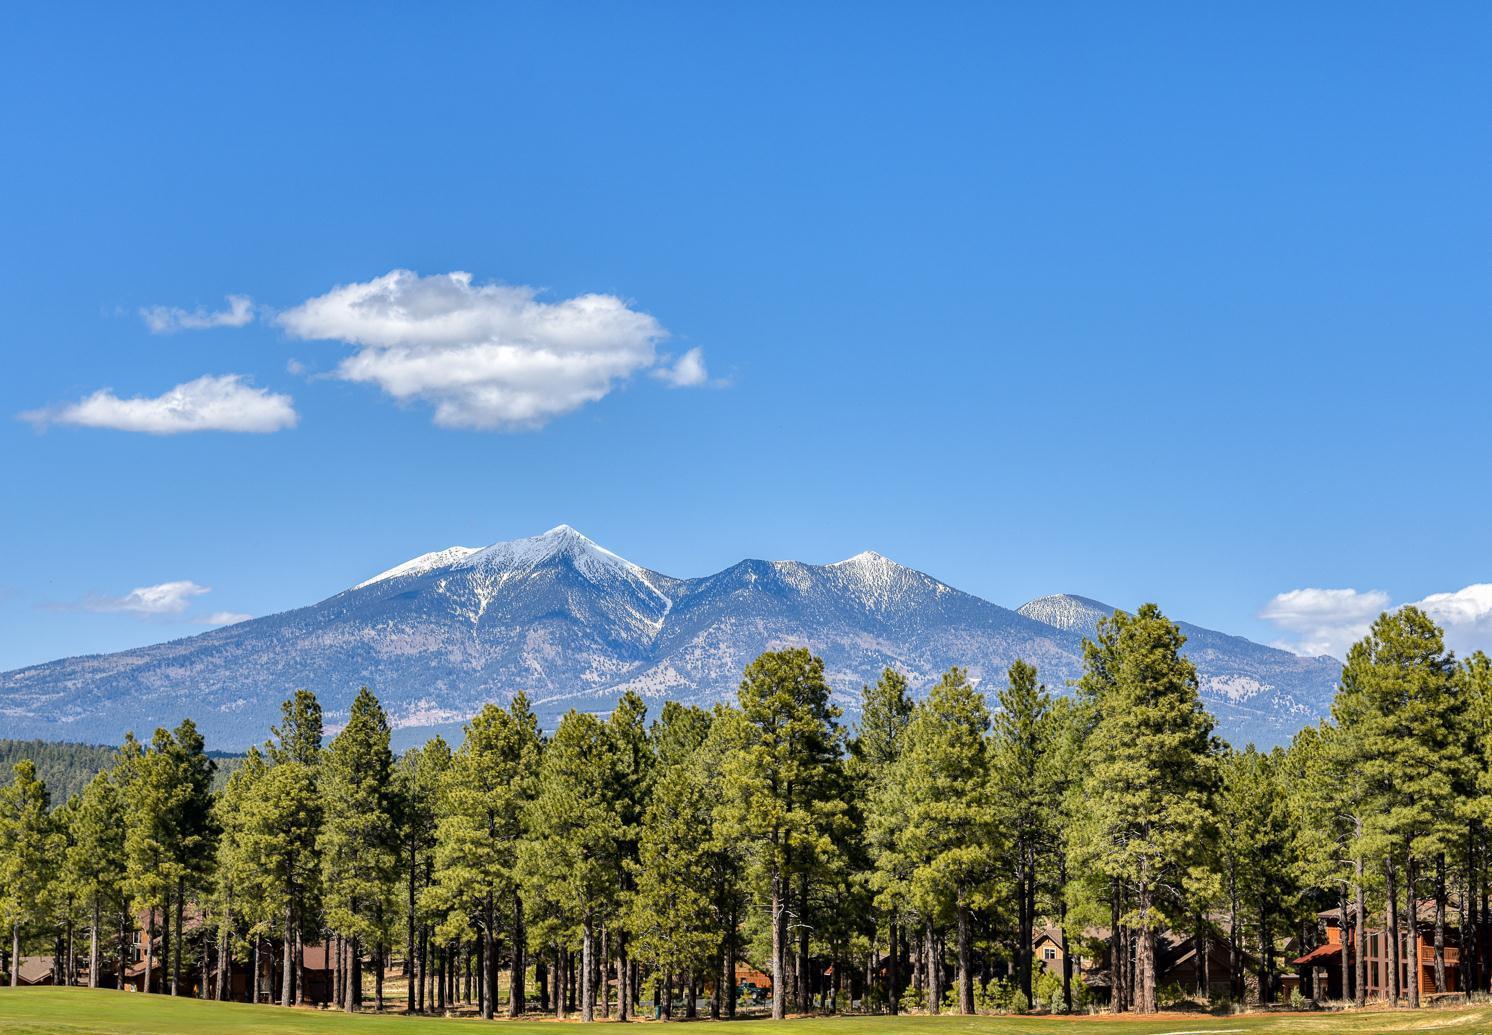 Woody Mountain Estates:Woody Mountain Estates